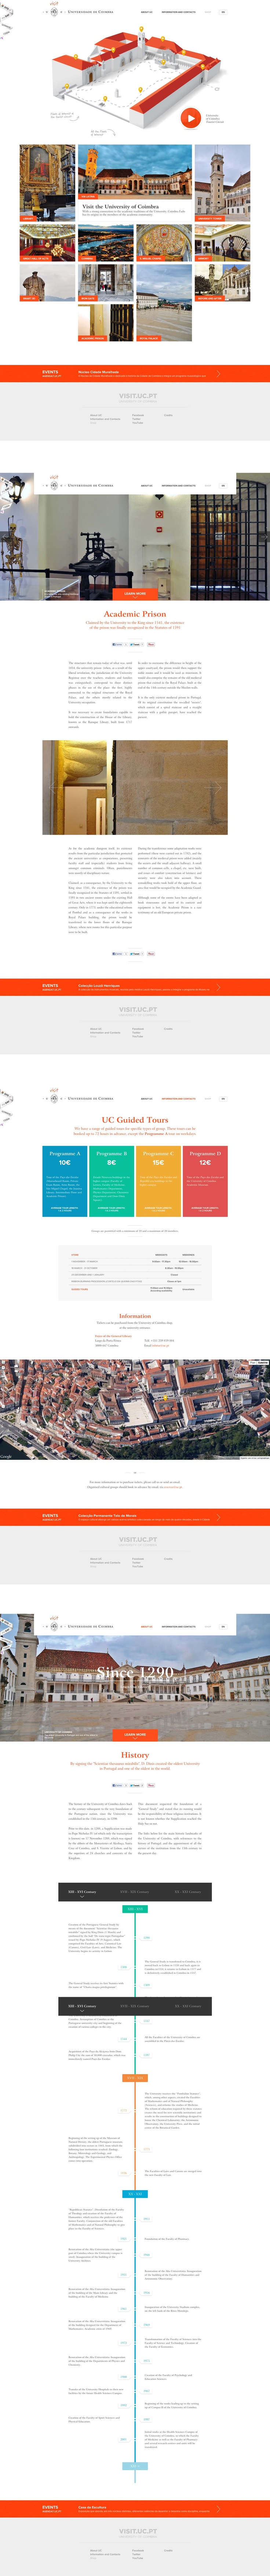 Visit Universidad de coimbra - #musee #webdesign #website #inspiration #university #school